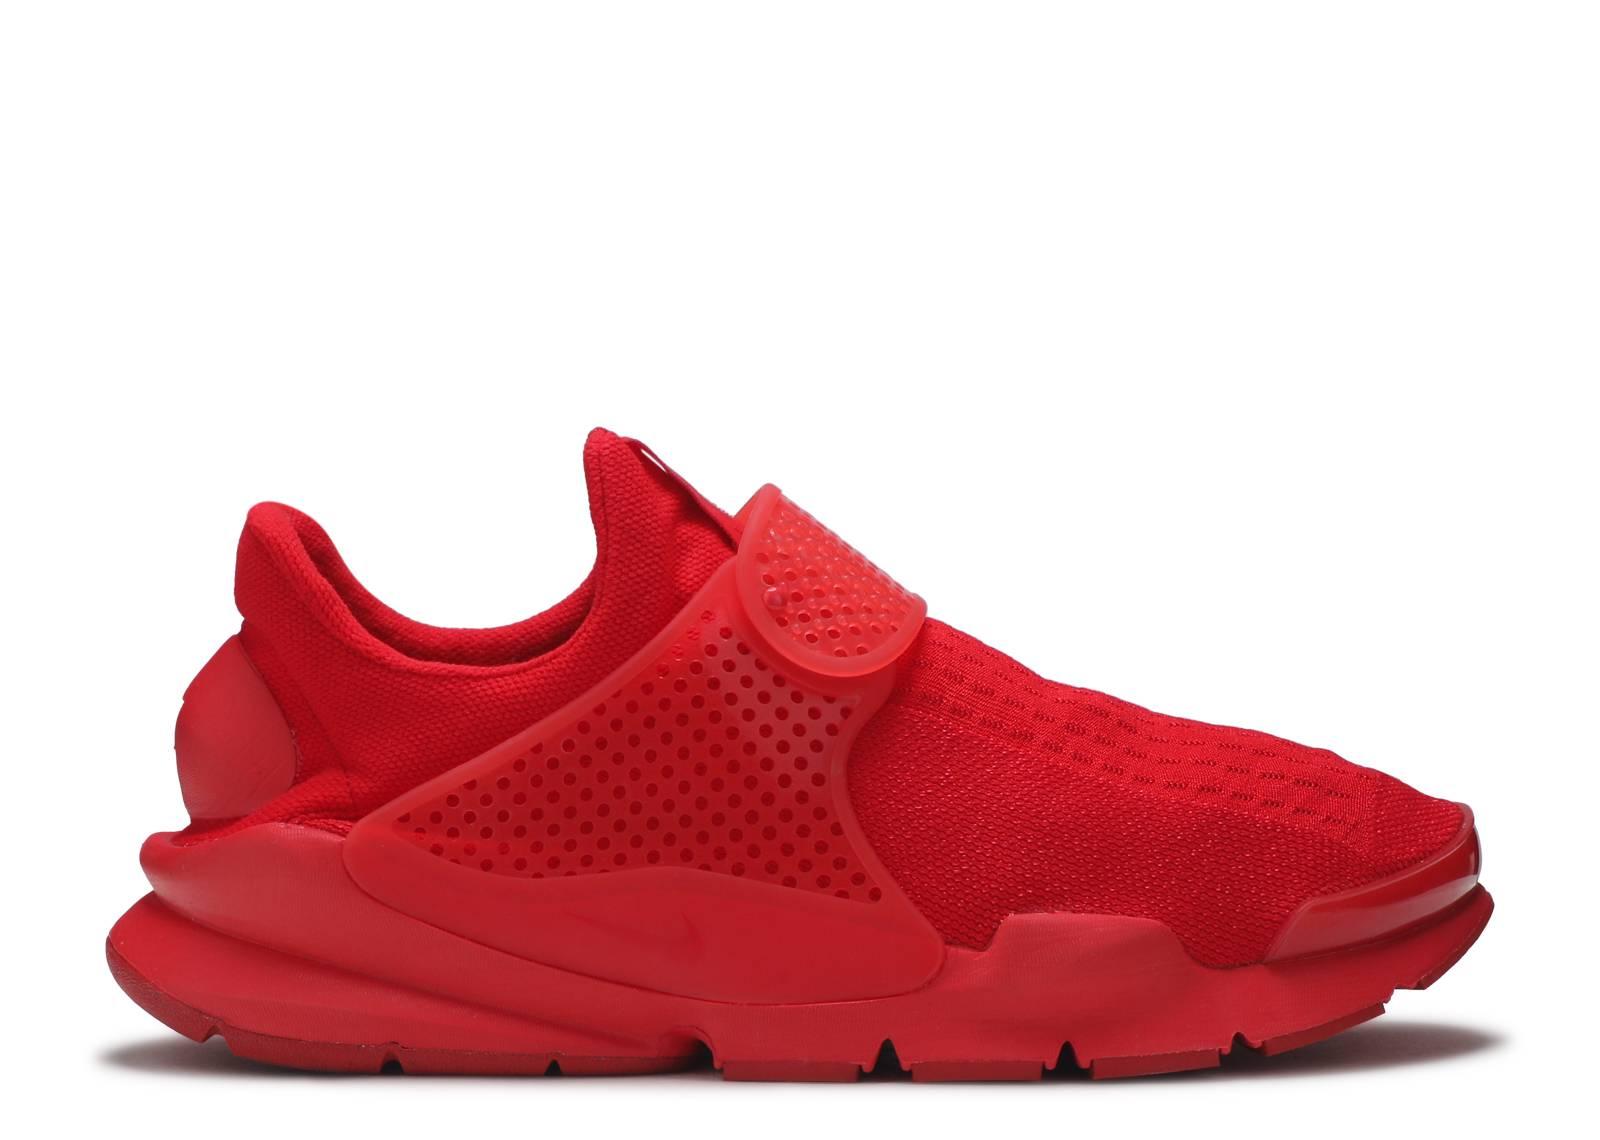 da70456bdb8 Nike Sock Dart KJCRD - Nike - 819686 600 - university red university ...